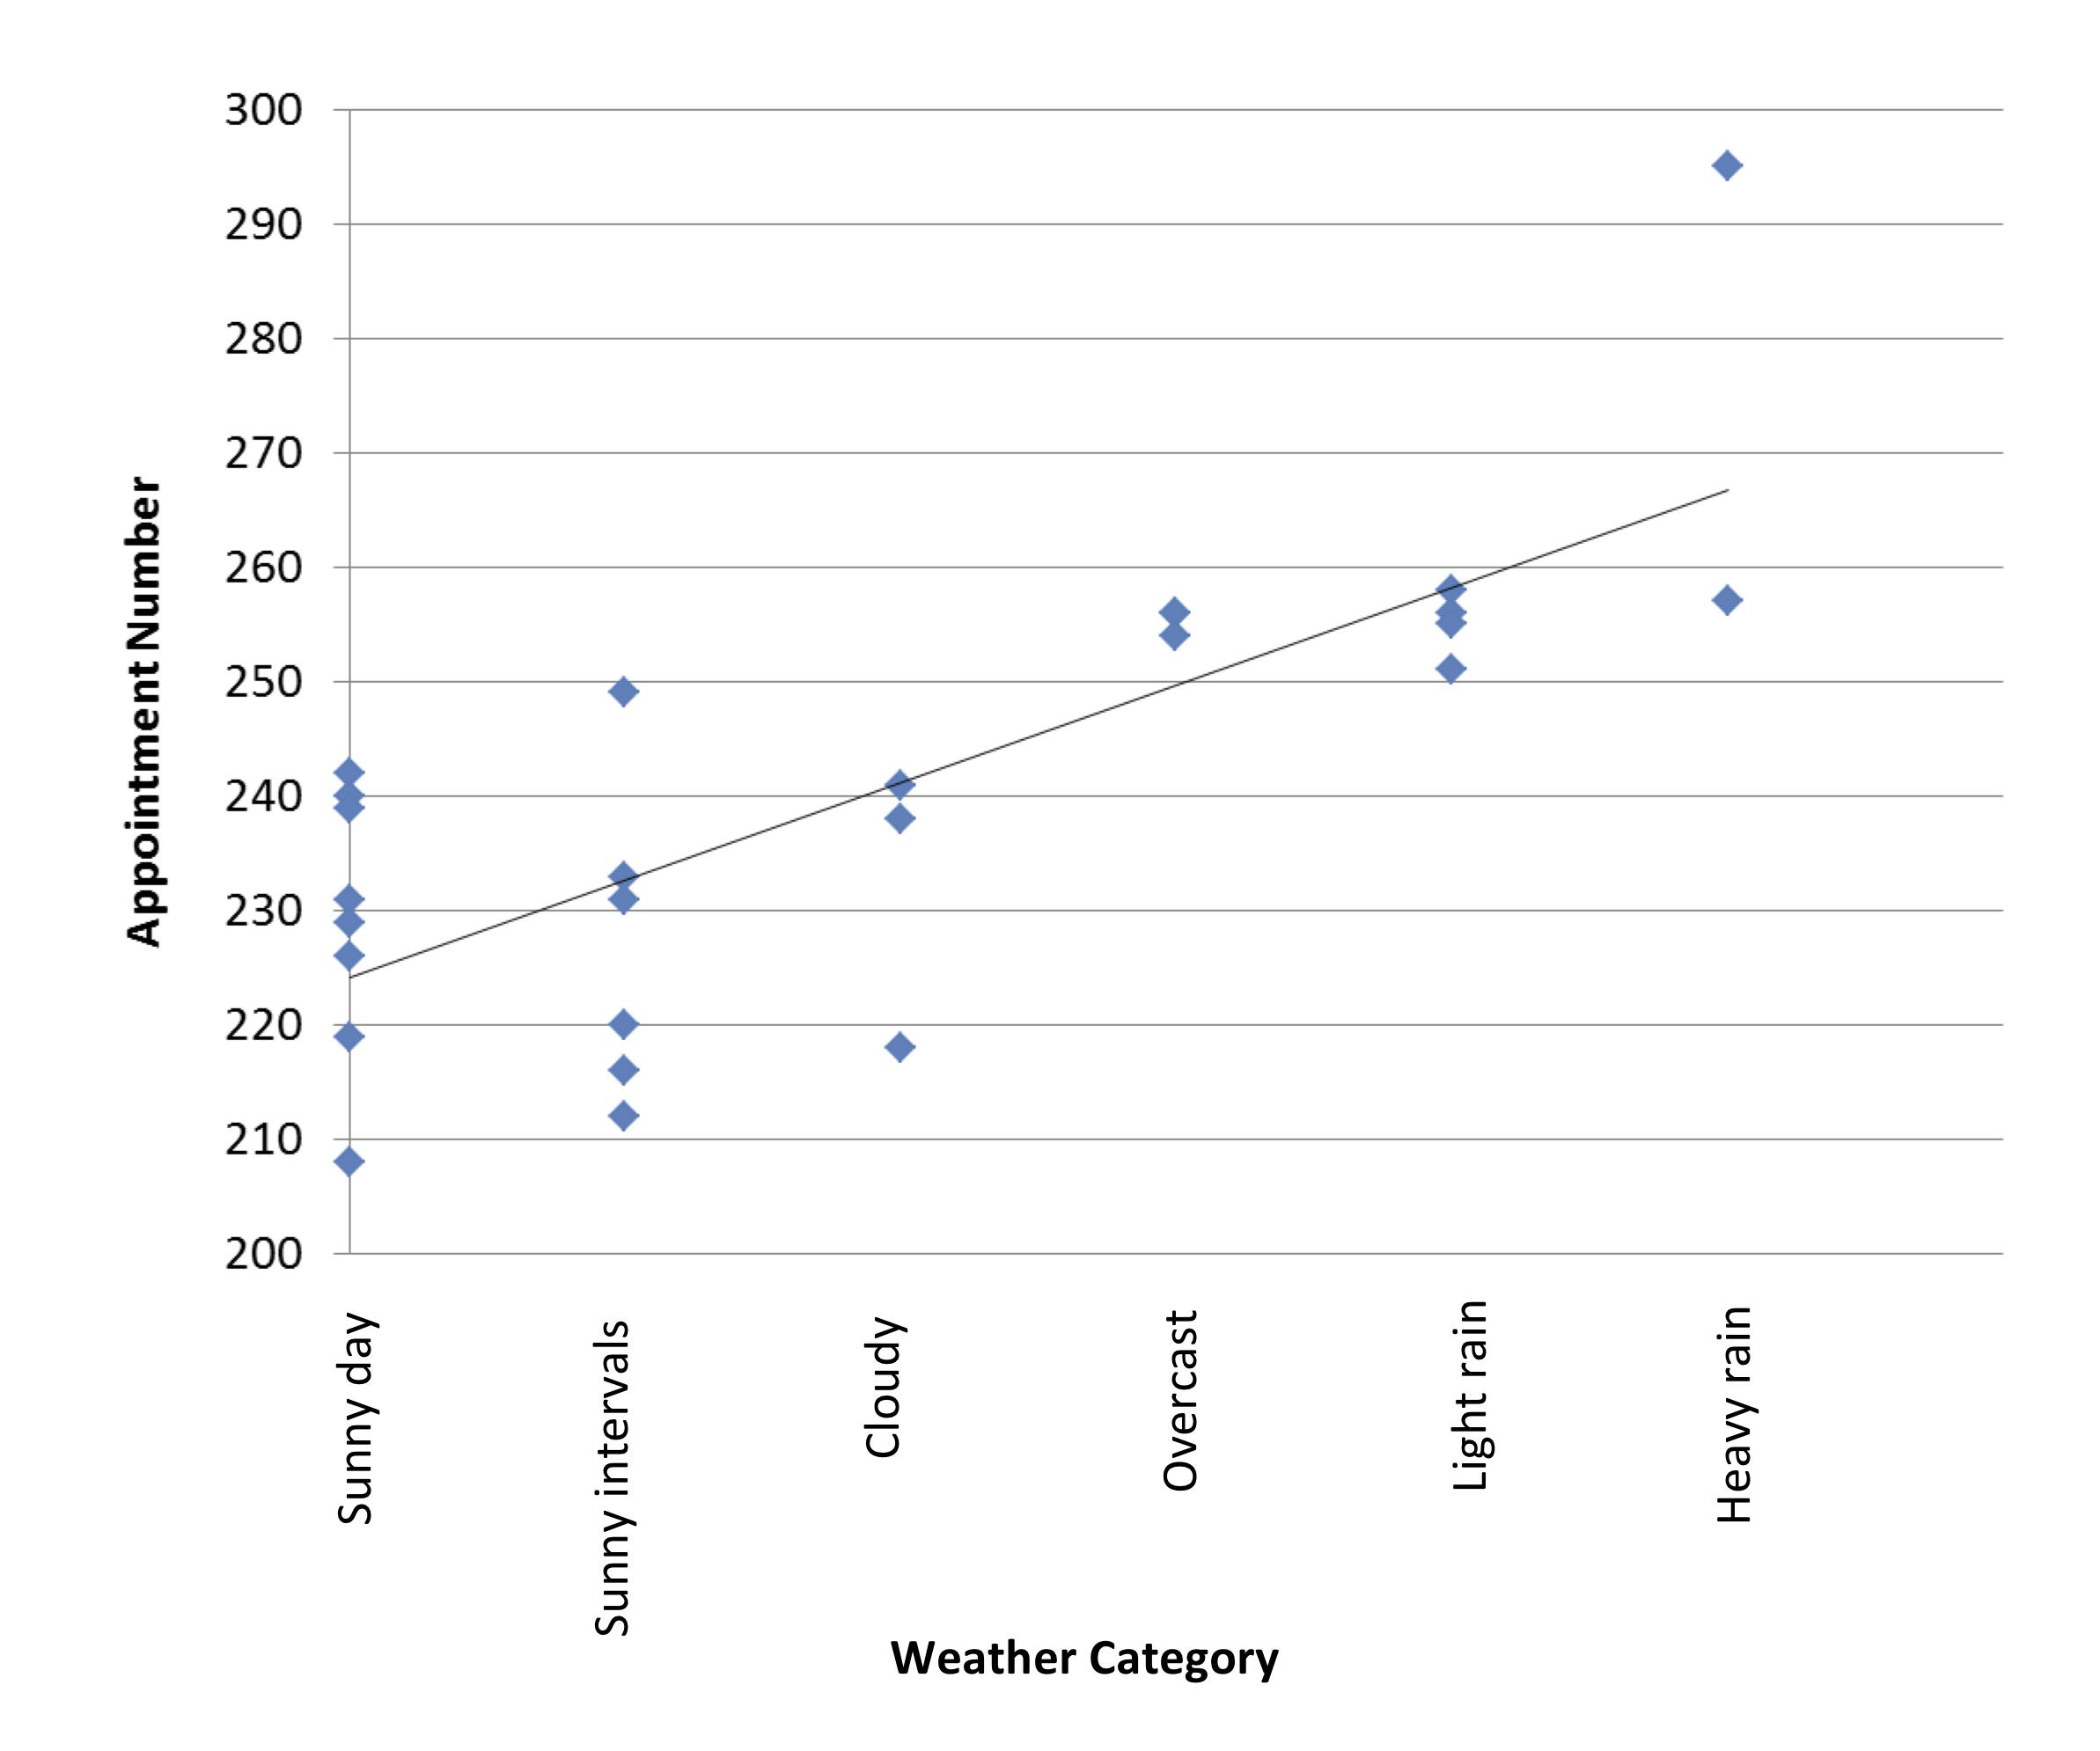 Weather Category v demand